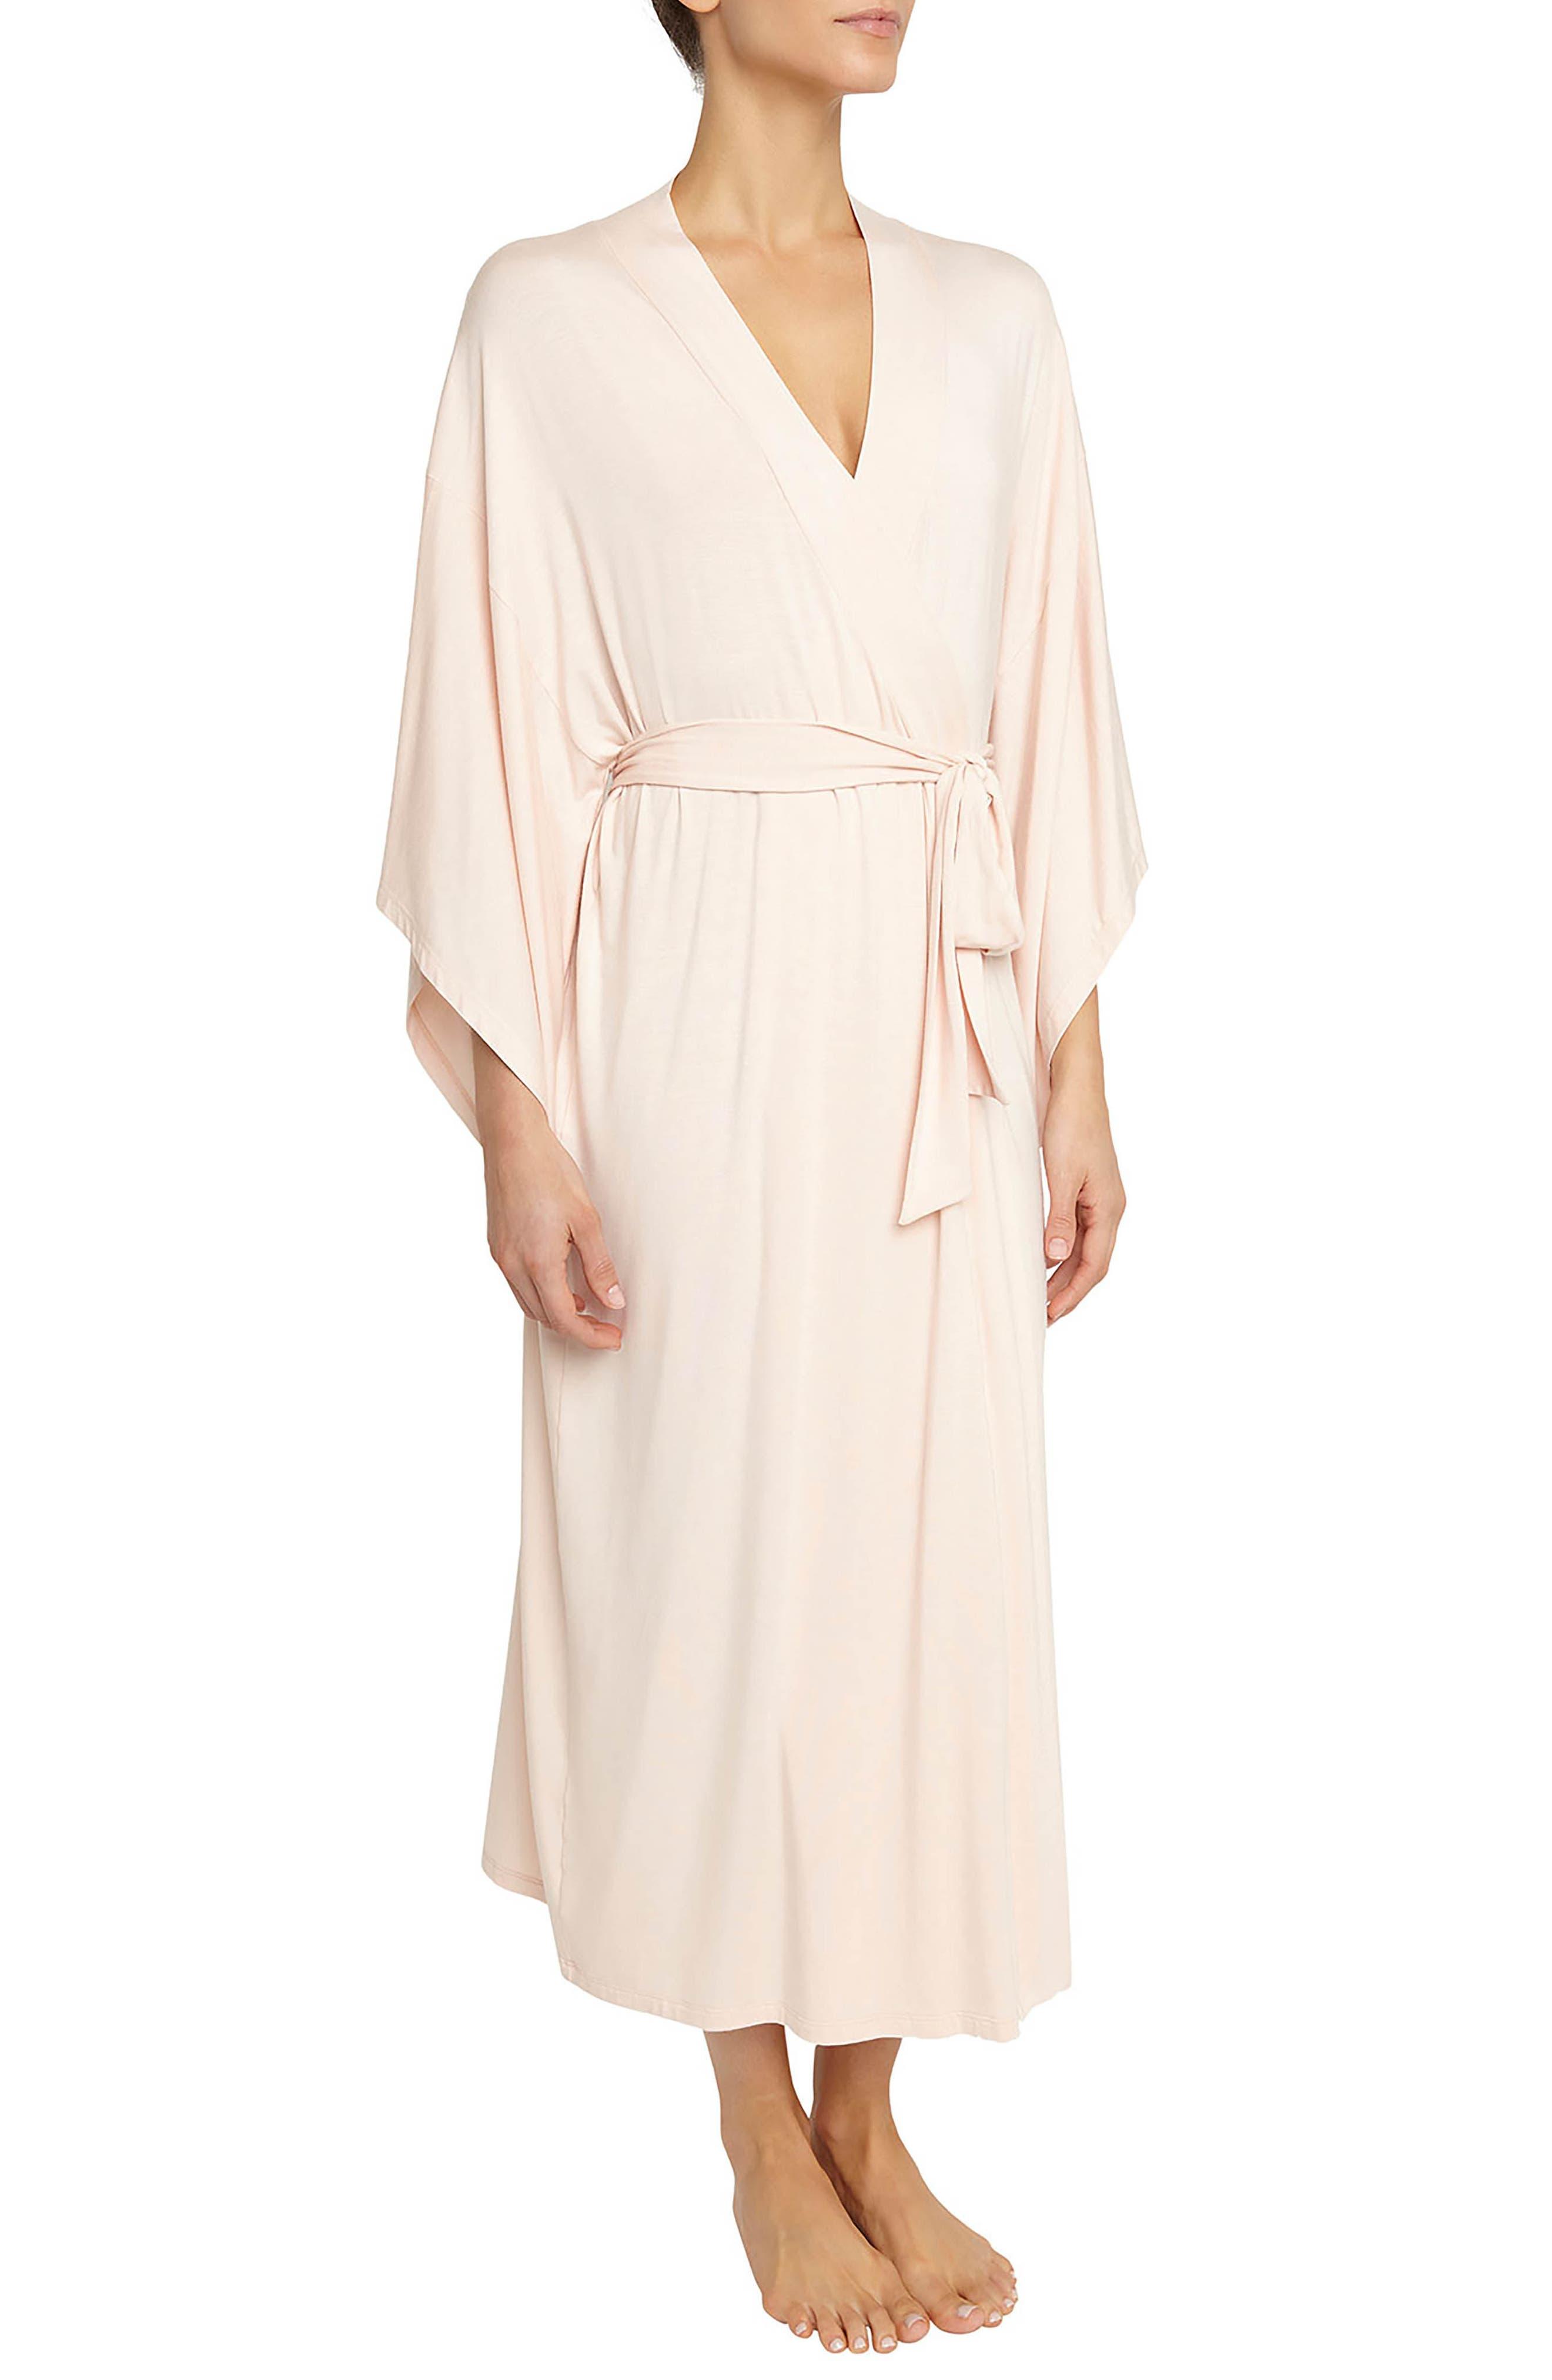 Eberjey 'Colette' Kimono Sleeve Long Robe